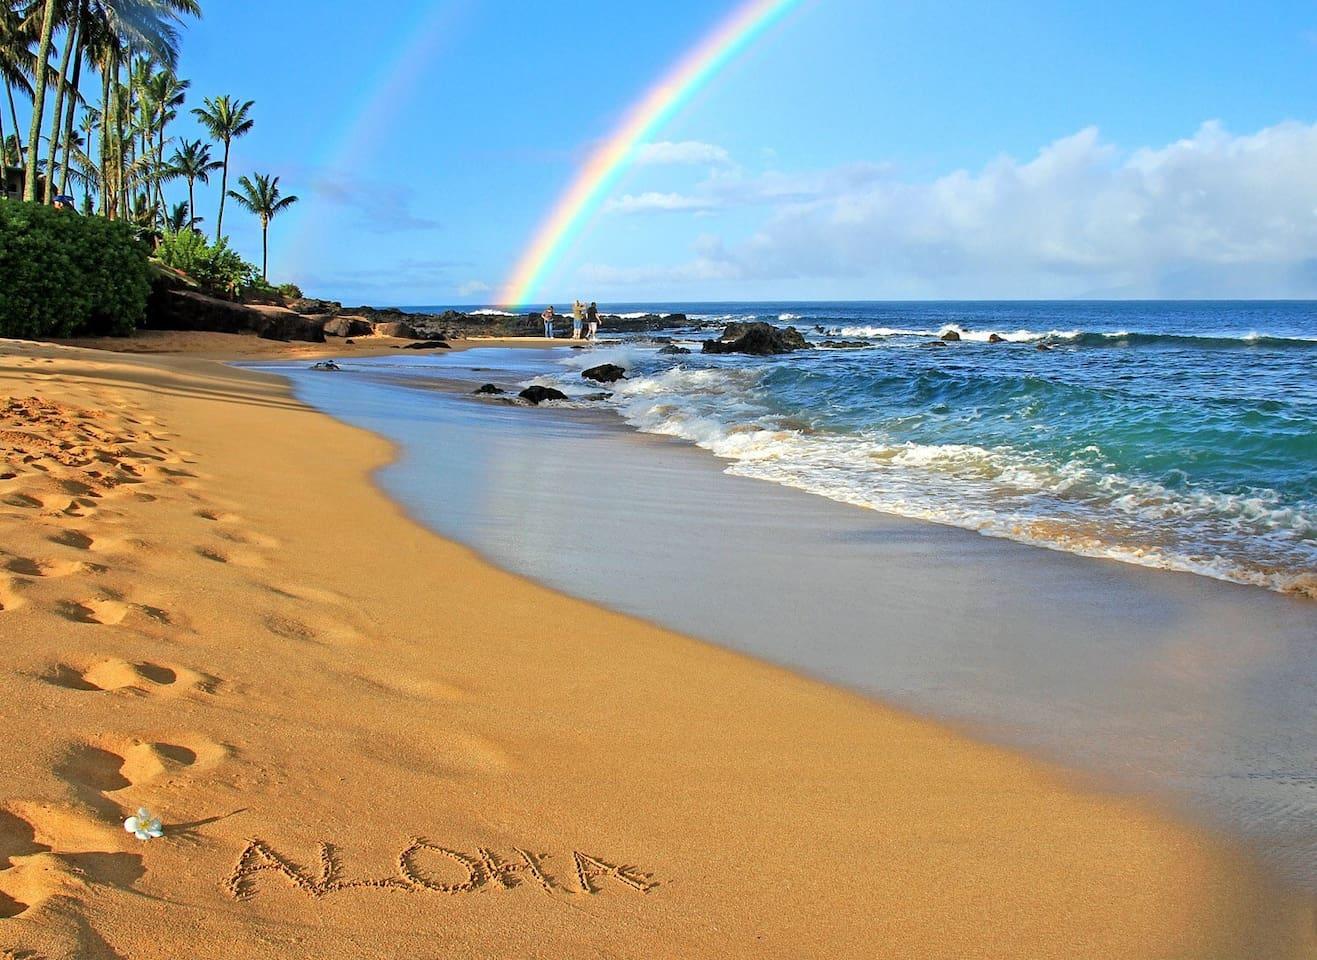 Beautiful Sugar Beach in Kihei, Maui